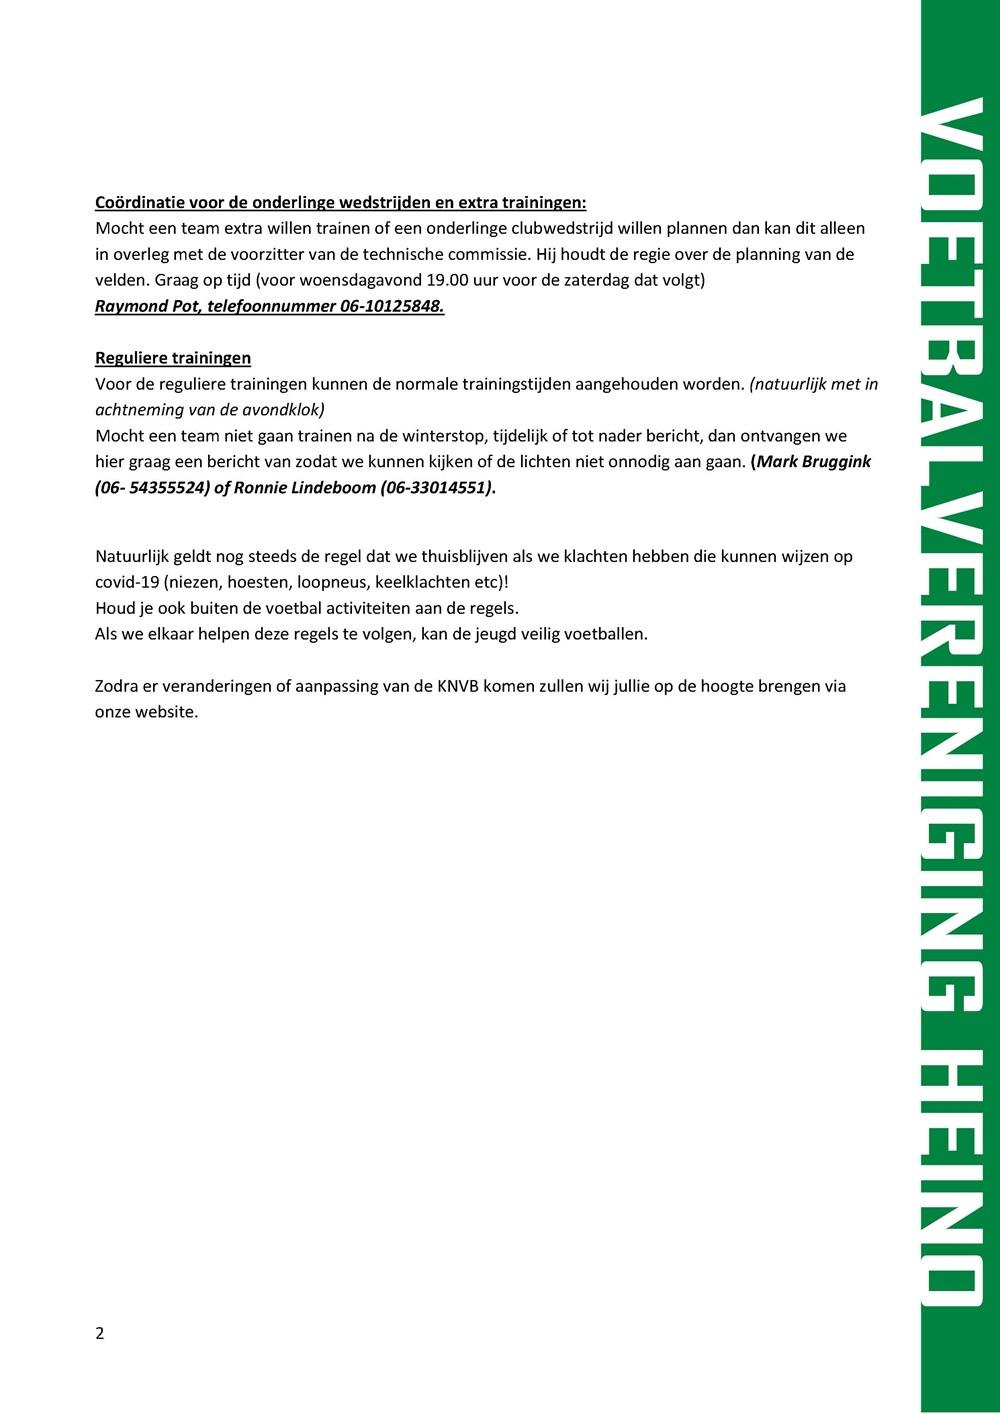 coronamaatregelen_03-03-21_Pagina_2.jpg